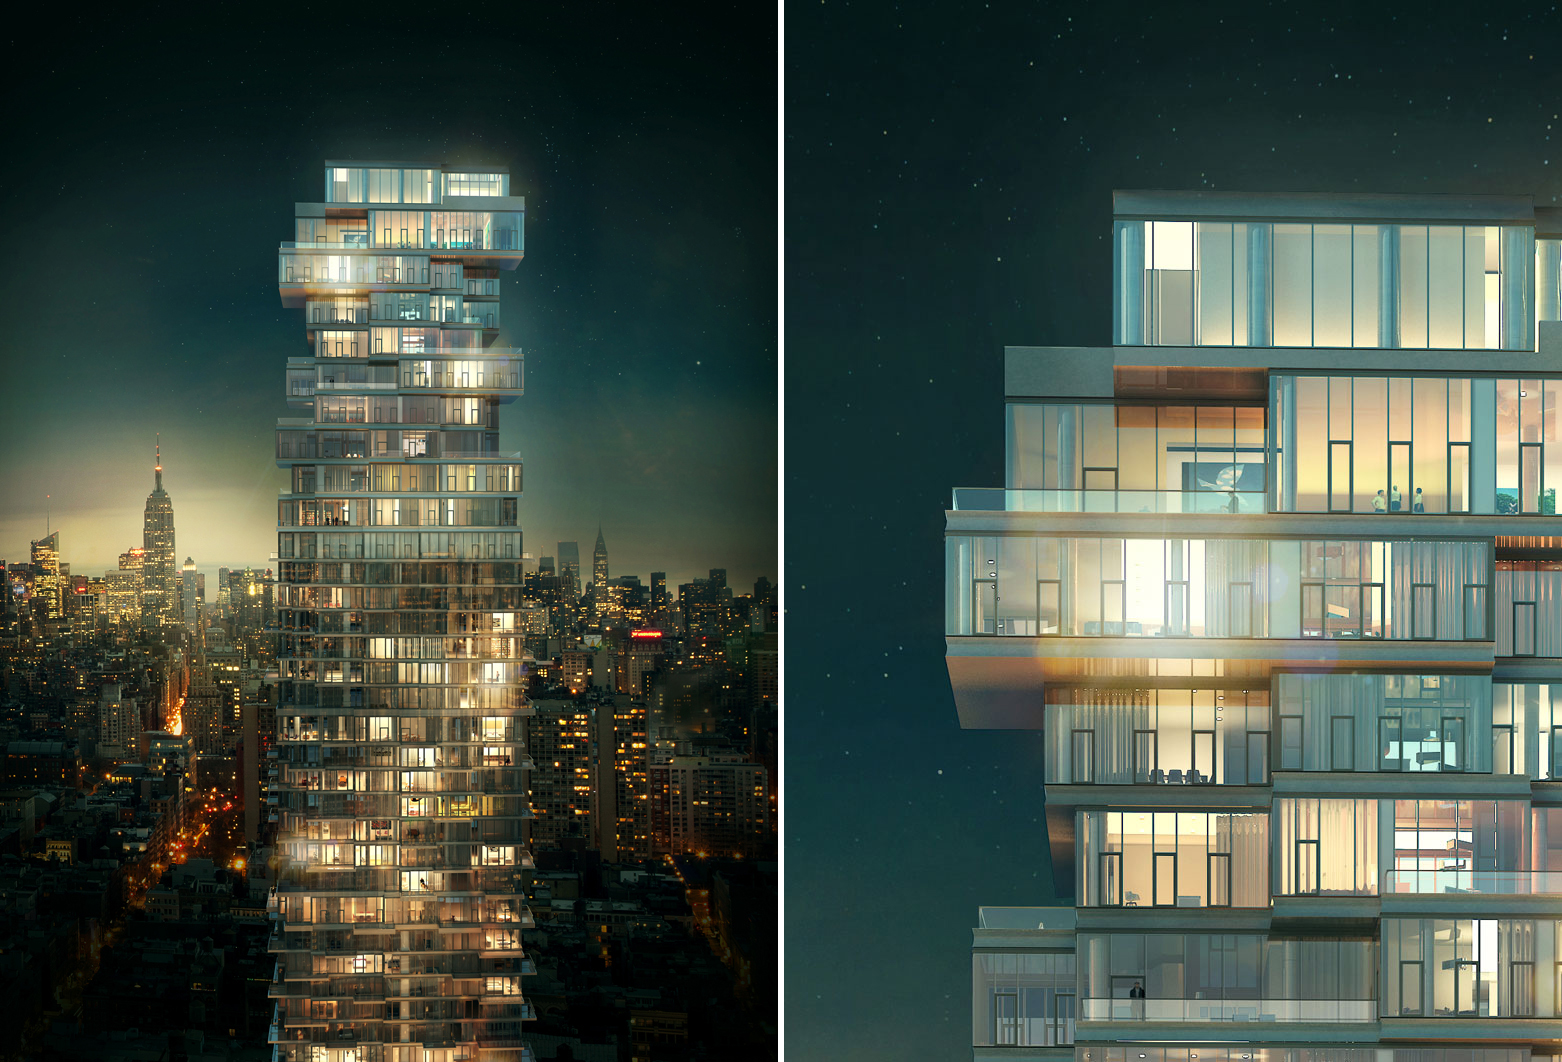 56 Leonard, Herzog & de Meuron, Tribeca condos, Alexico Group, GHWA, WSP group, NYC skyscrapers, Manhattan skyline, Downtown, New York City construction